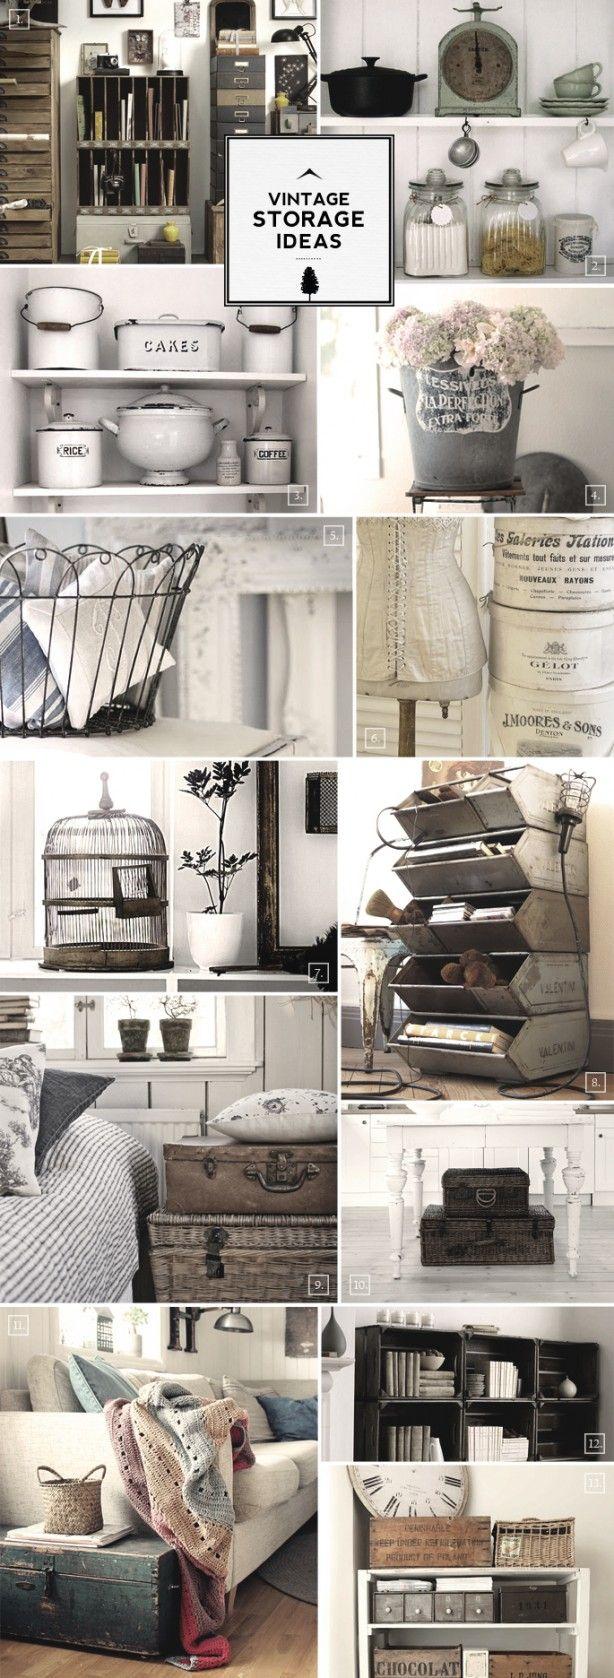 vintage storage ideas. LOVE, love and love!